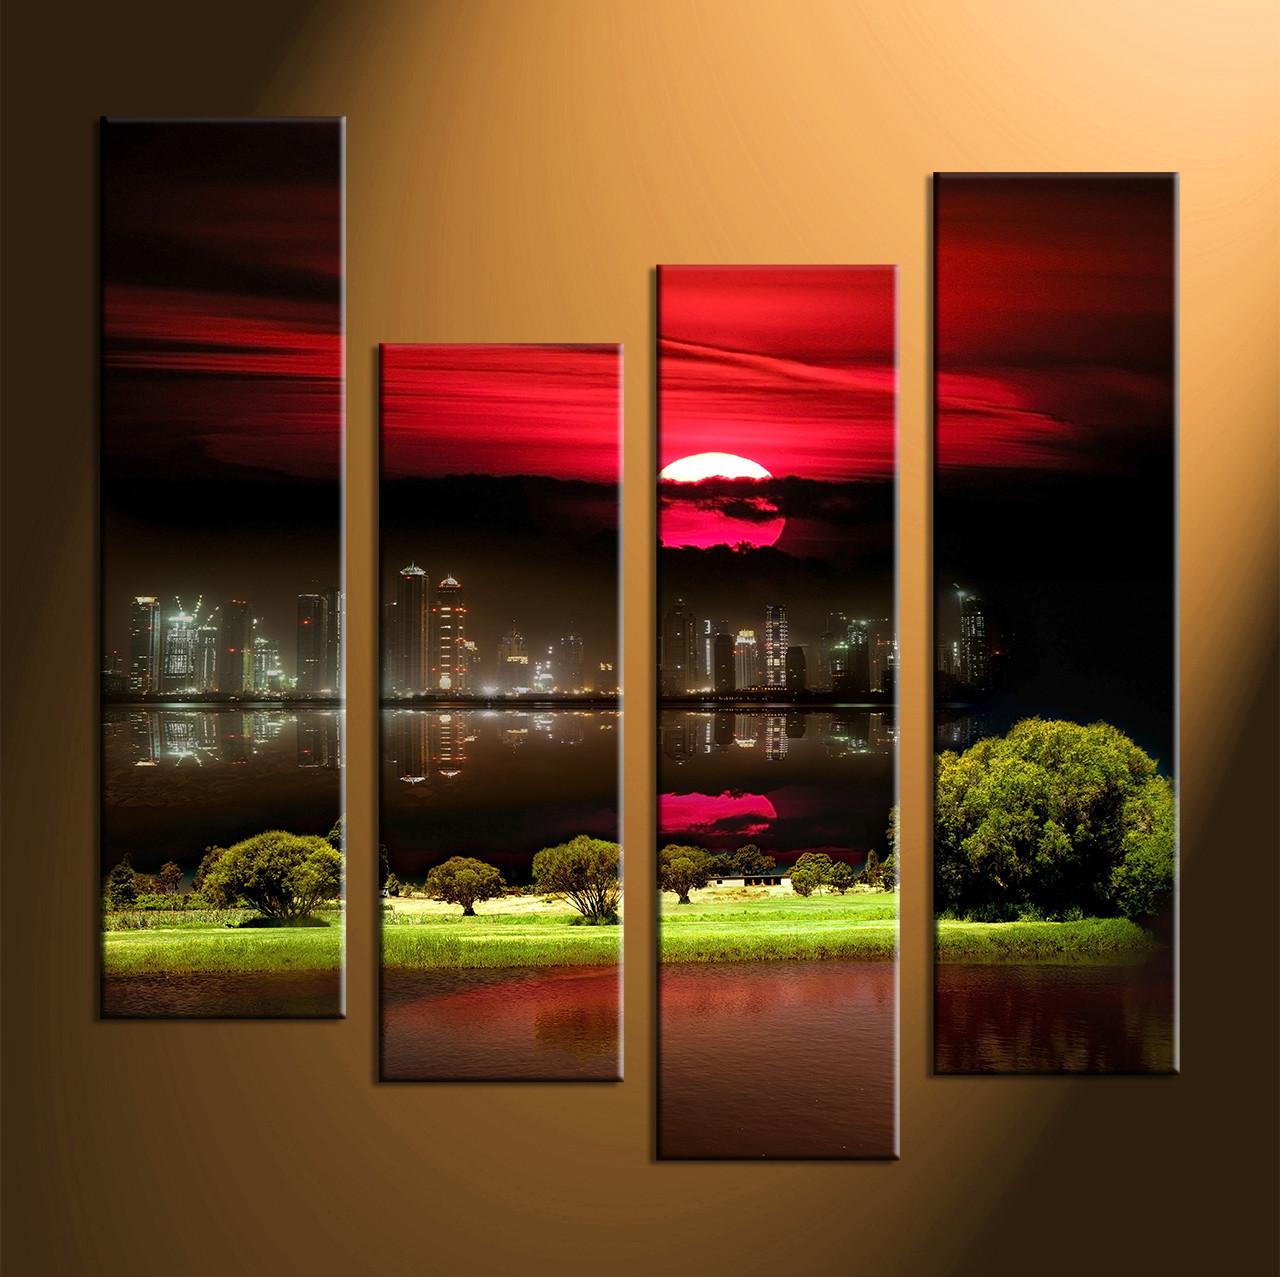 4 Piece Black Red Moon Art,City Grass Large Canvas Prints,Landscape Wall Art